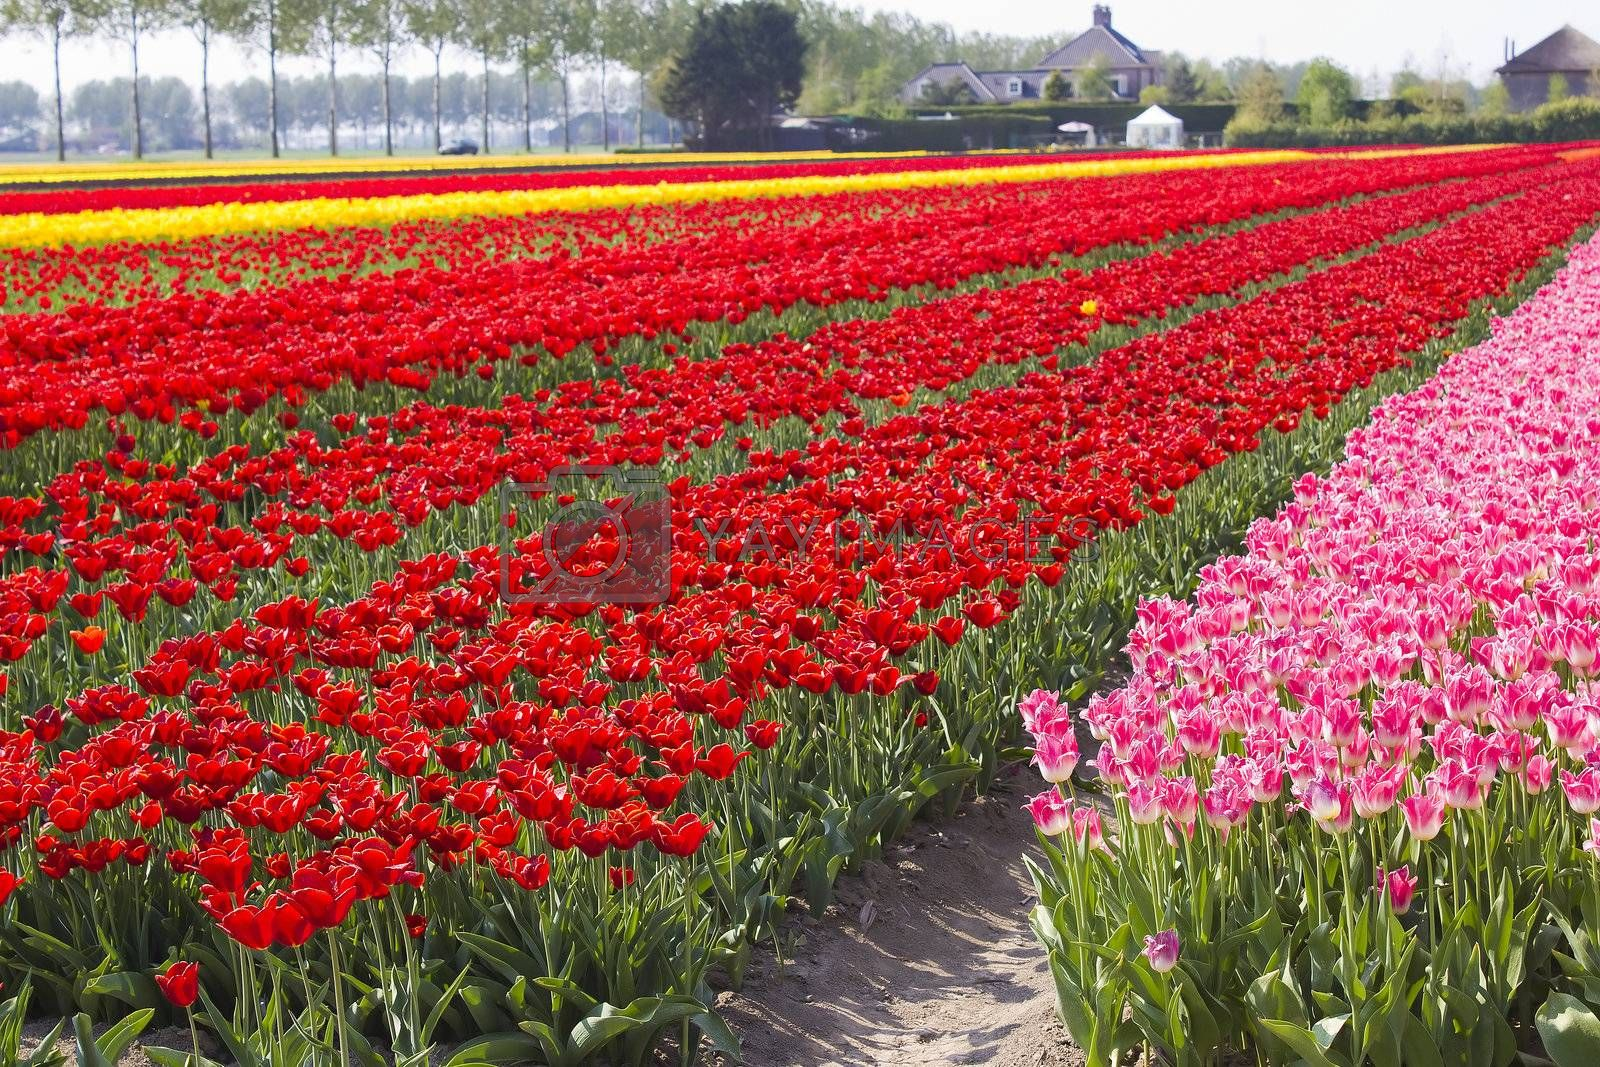 Multi colored tulip field in the Netherlands